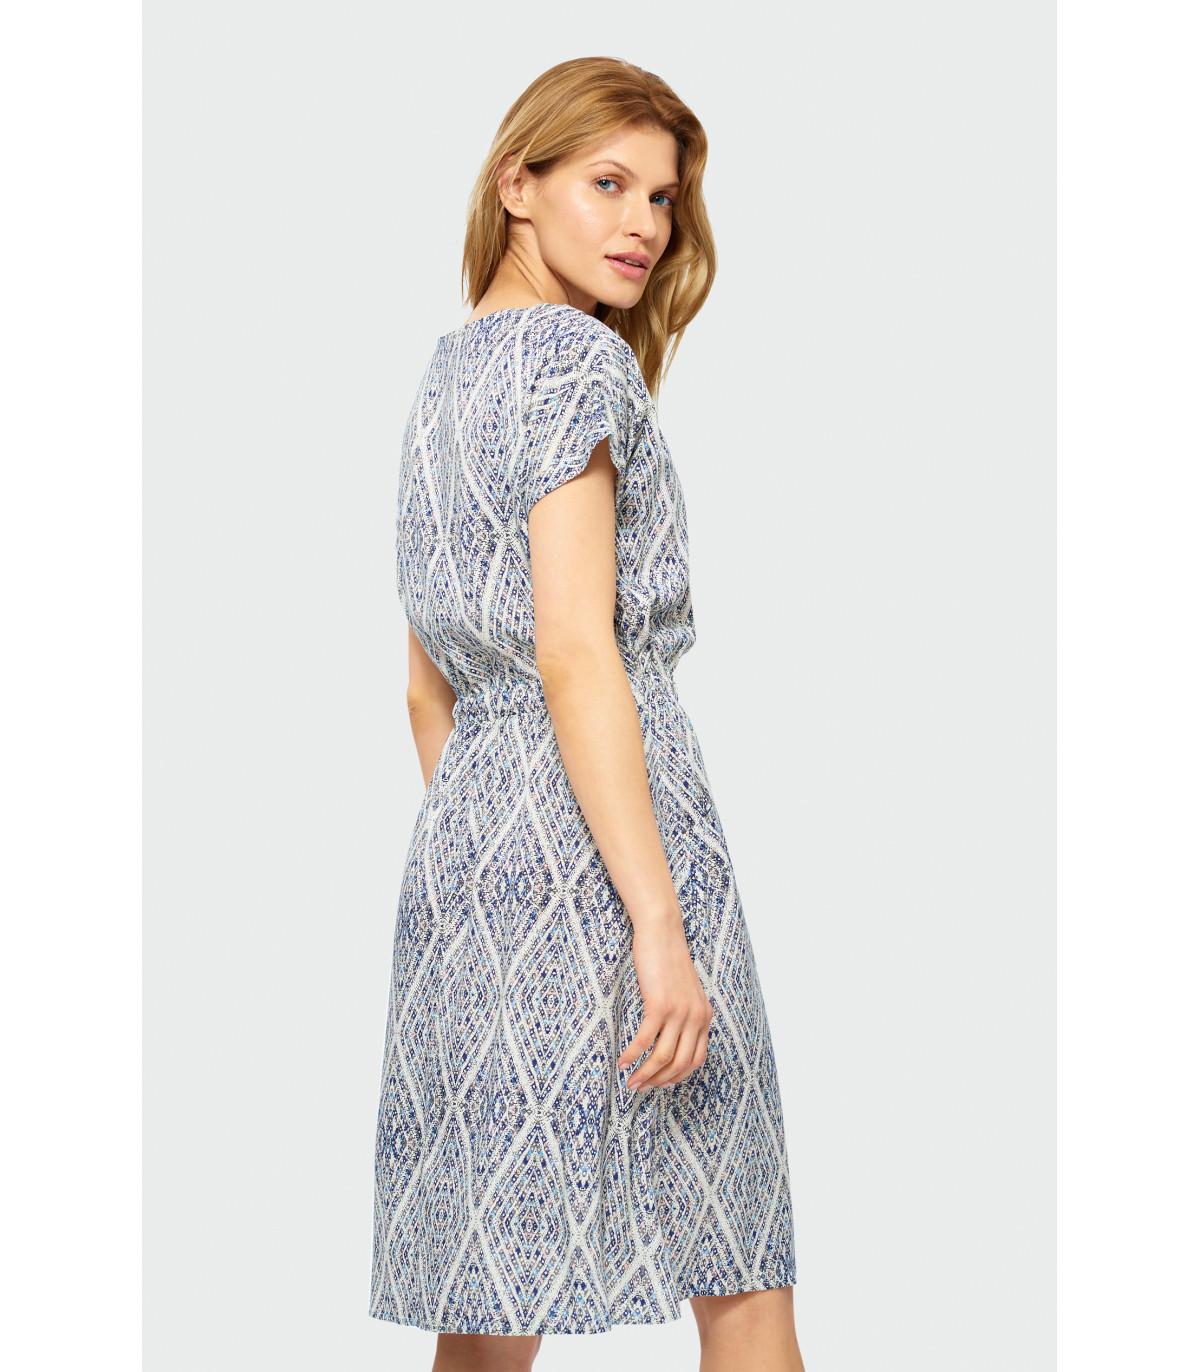 cf55b4203d Luźna sukienka we wzory Rozmiar 38 Kolor S19PRT27